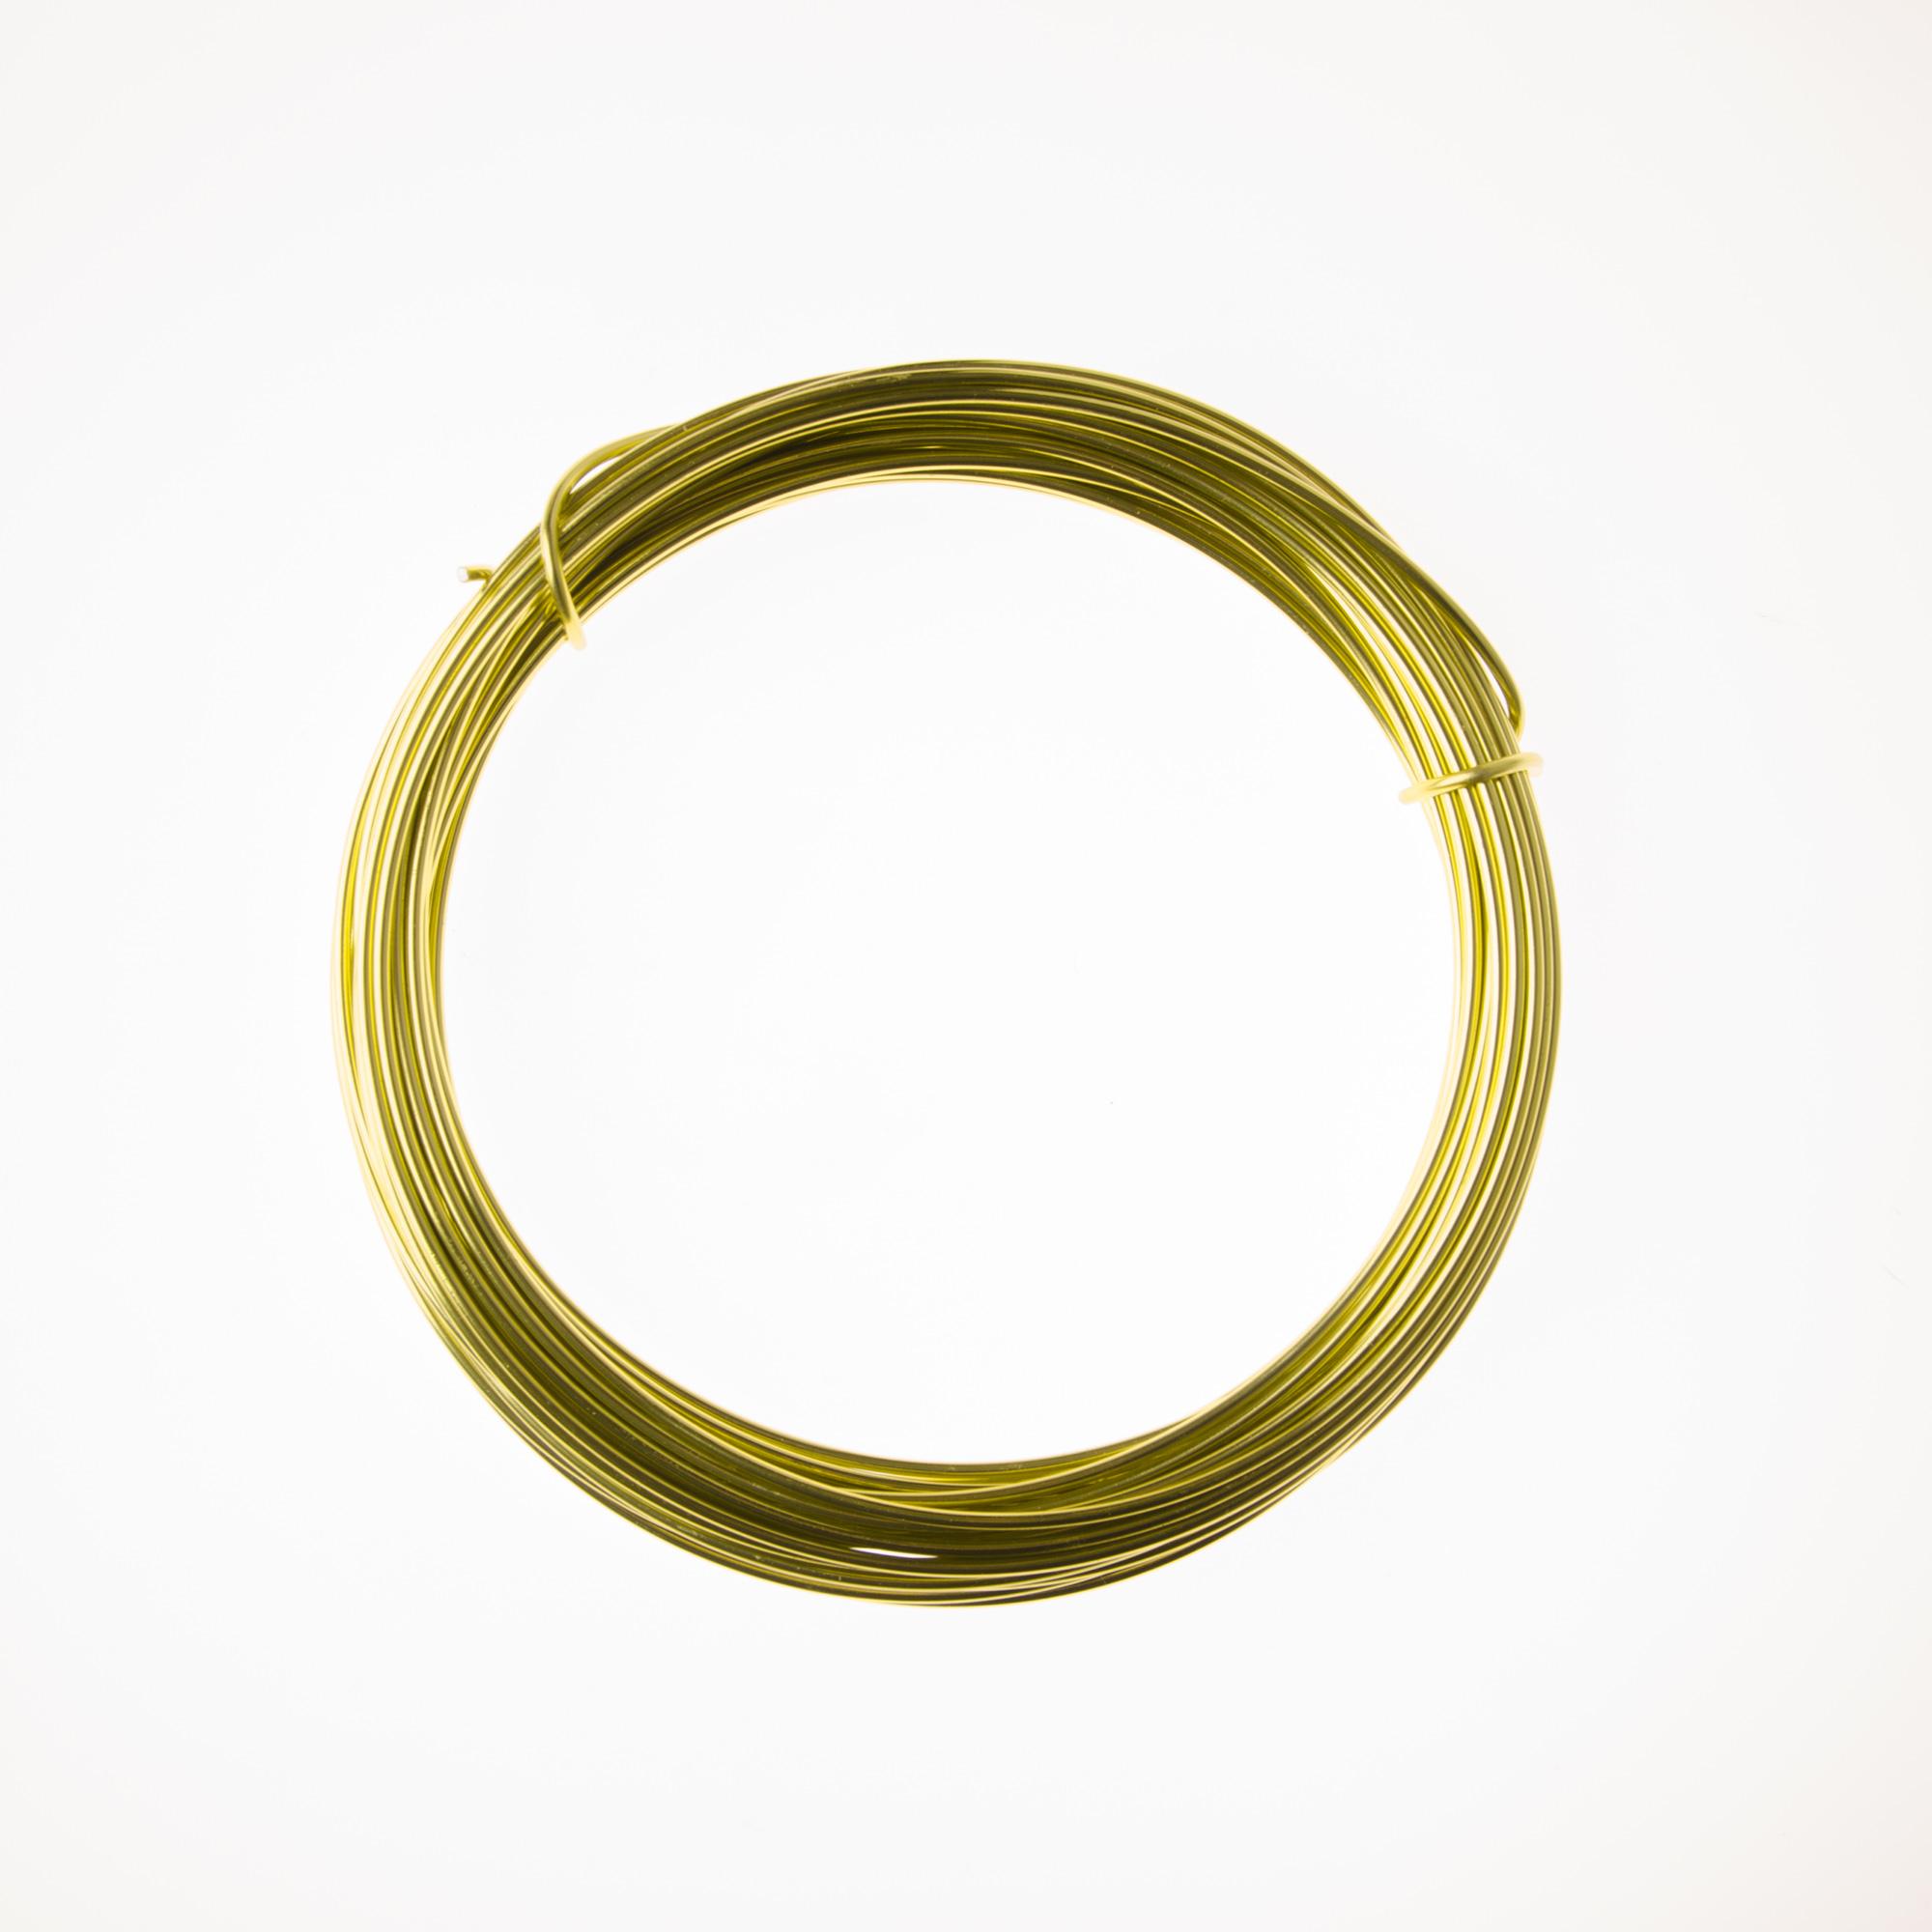 12 Gauge Peridot Anodized Aluminum Wire - 39ft: Wire Jewelry | Wire ...